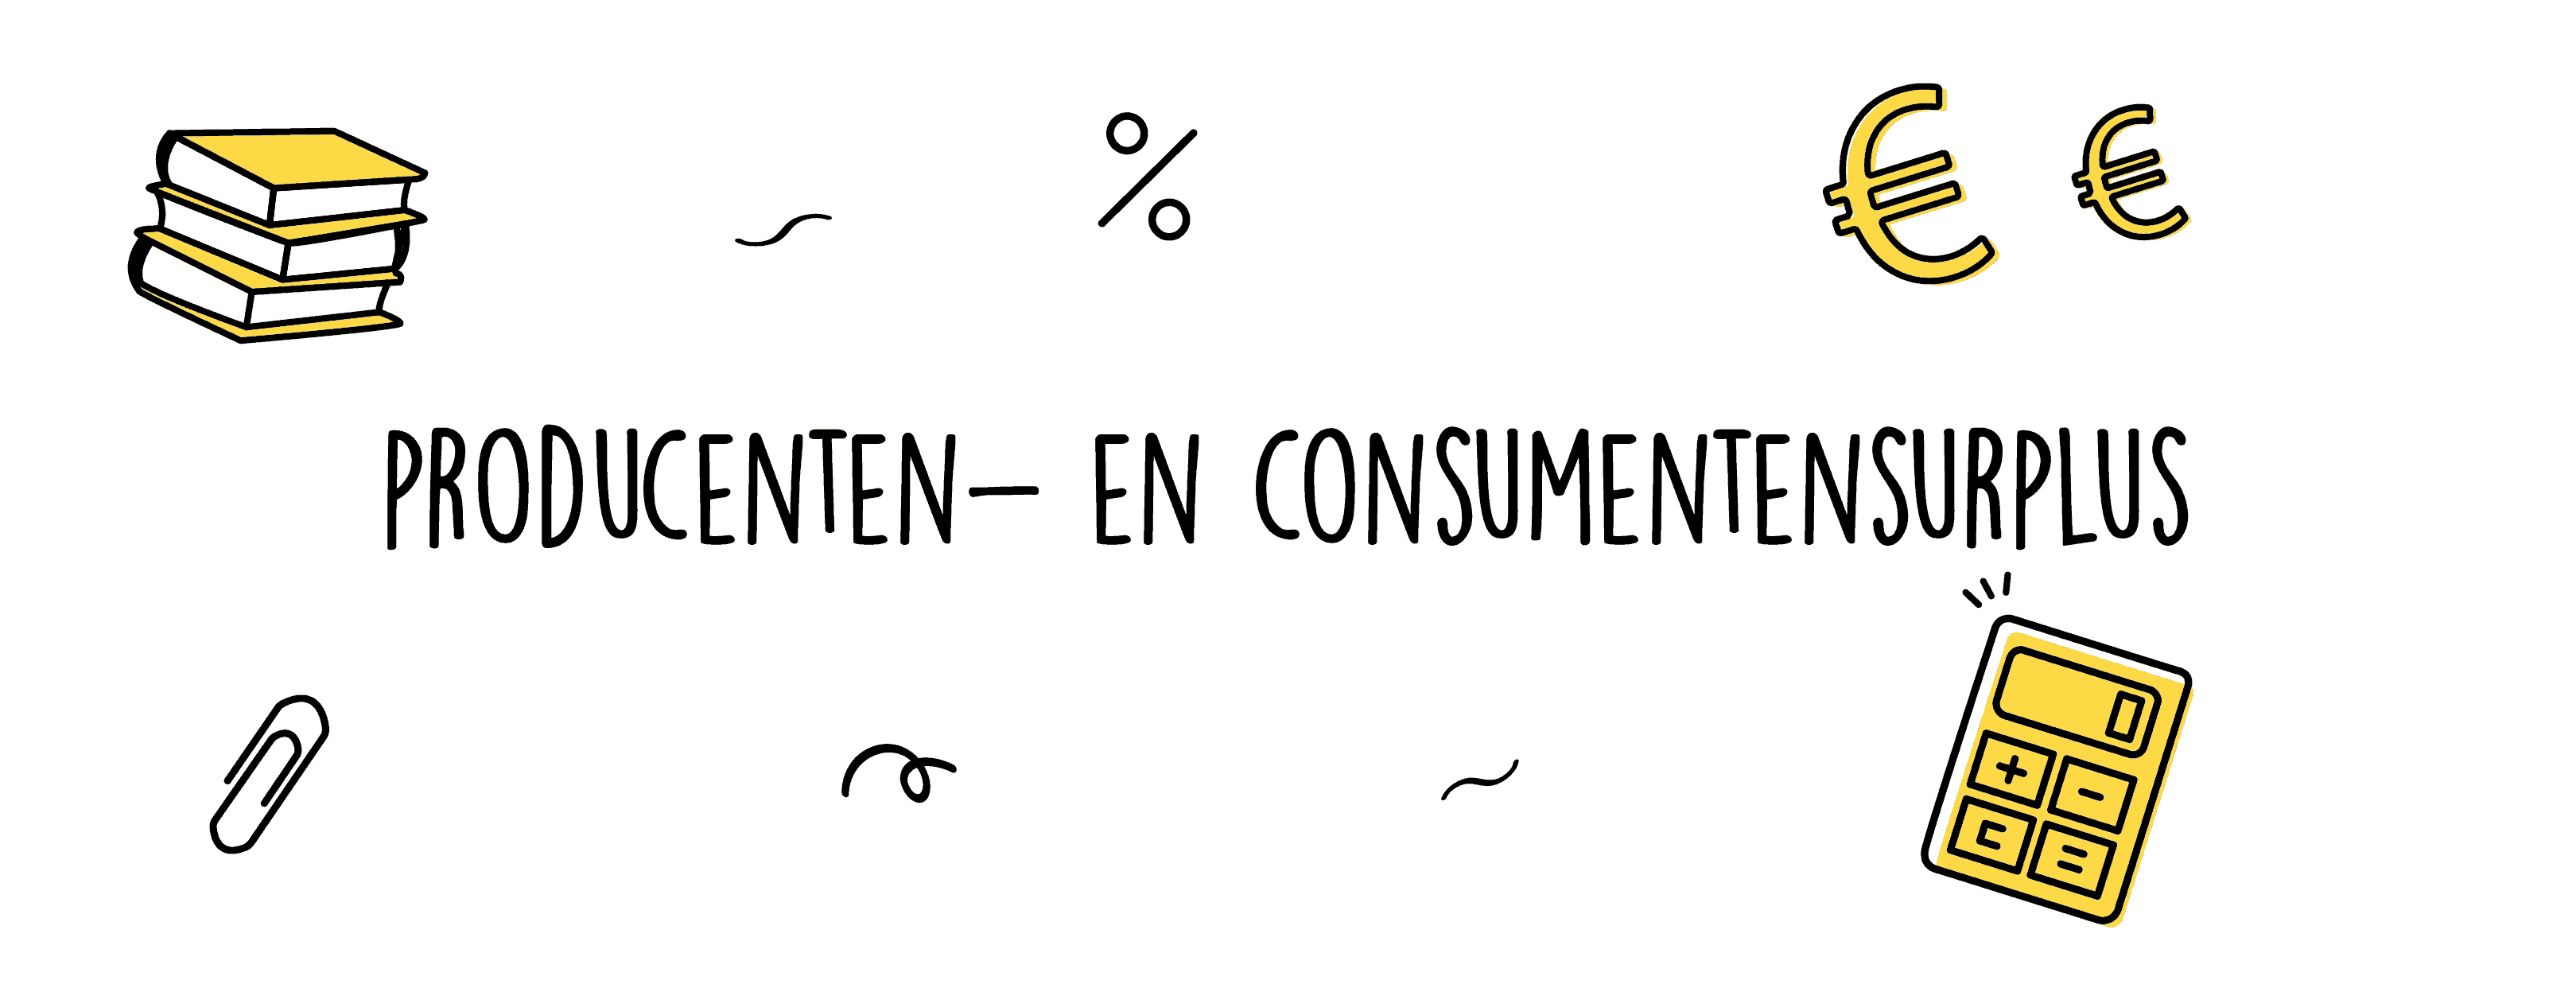 producenten en consumentensurplus